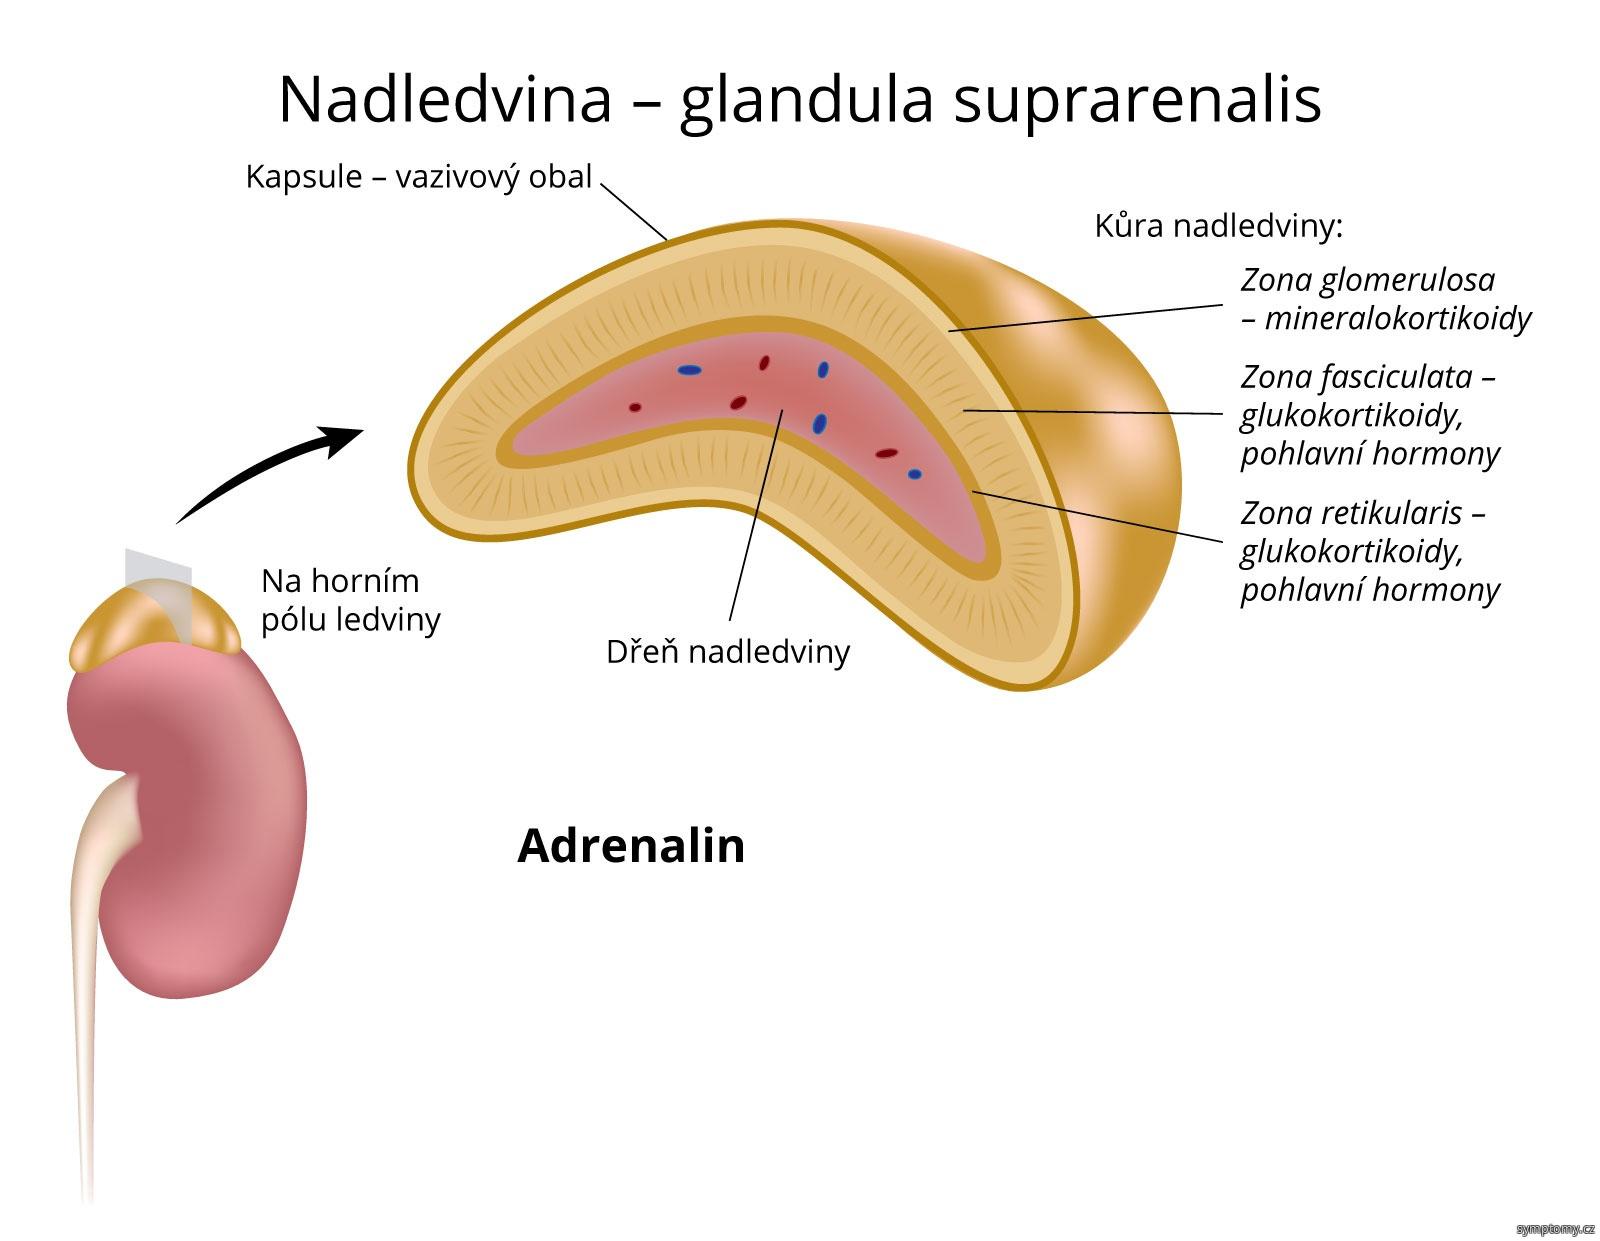 Nadledvina – glandula suprarenalis